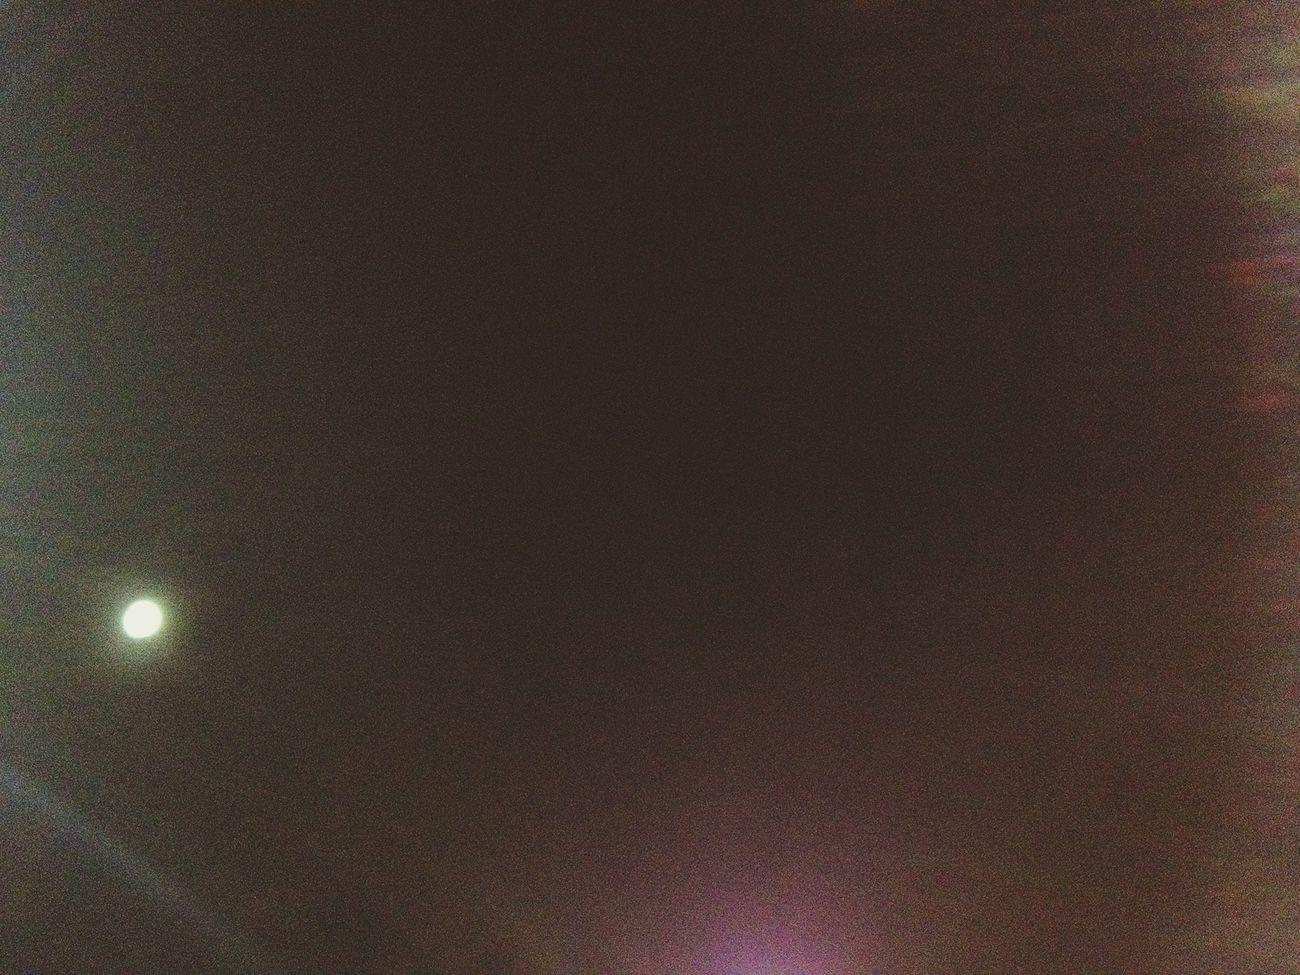 Moon The Night Sky